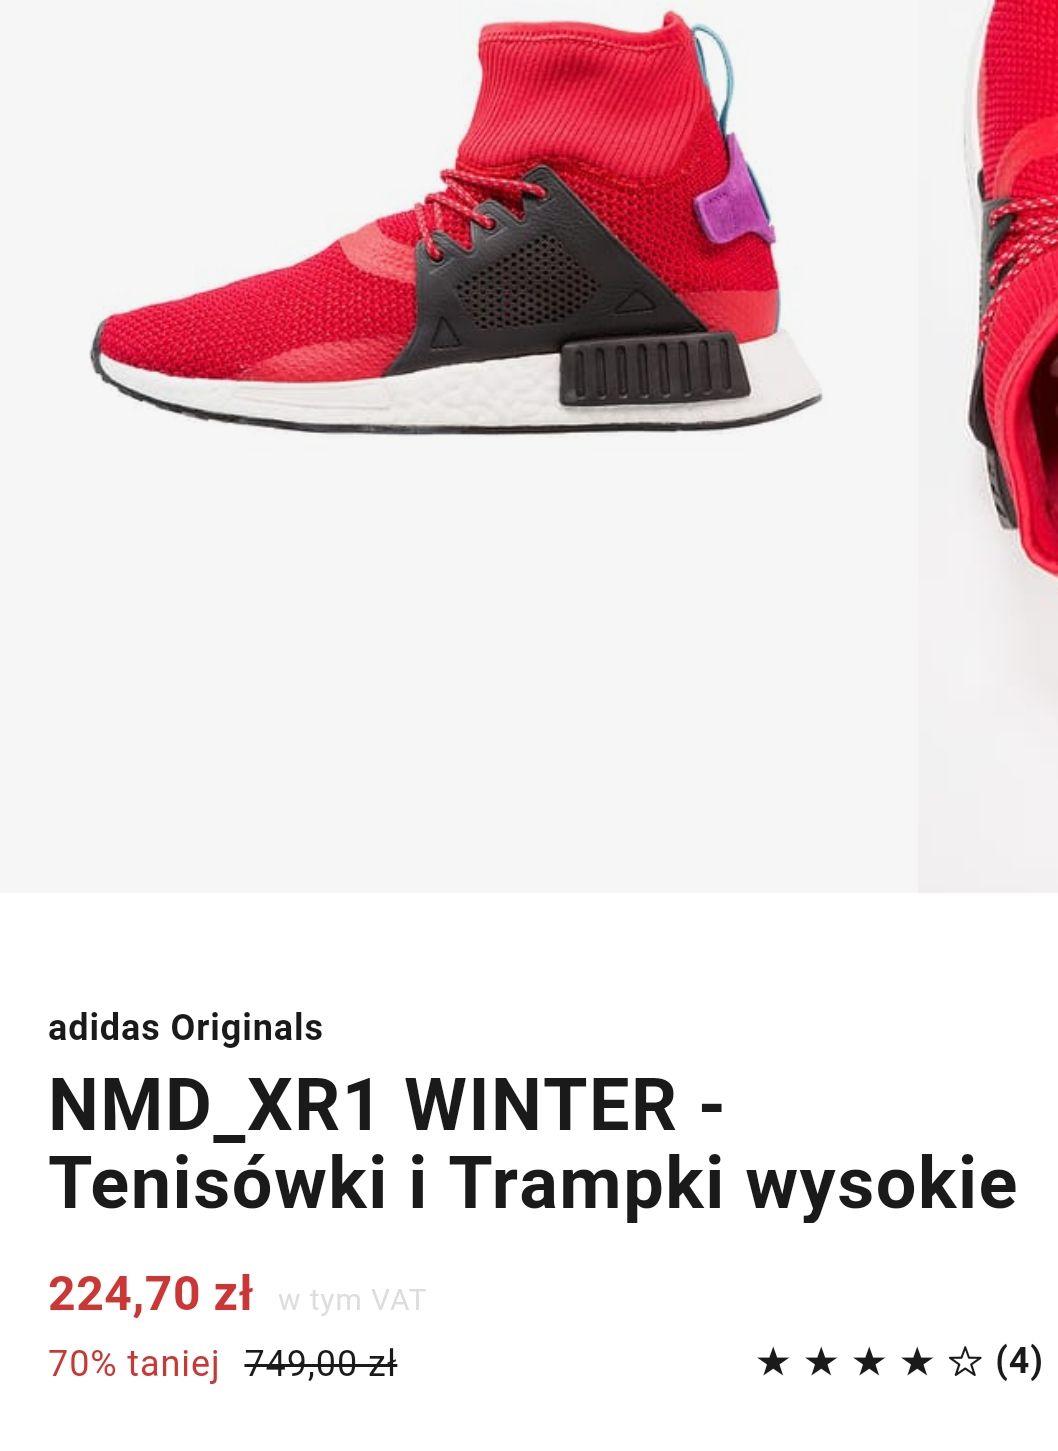 Adidas NMD_XR1 Zimowe